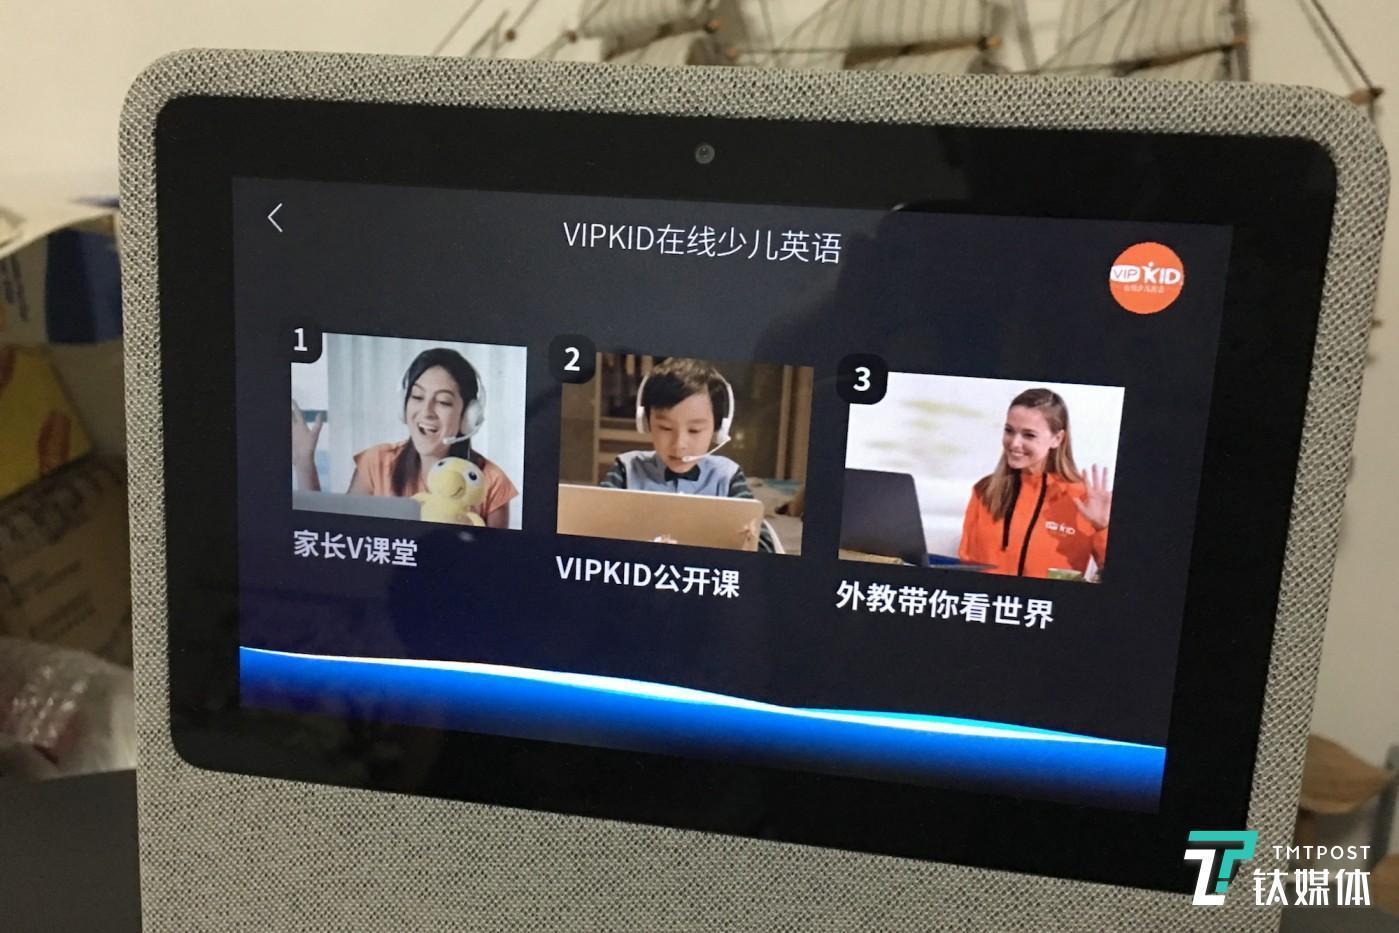 "VIPKID 中的少儿英语课程将以""技能内付费""的形式展现在小度在家等智能设备中。"